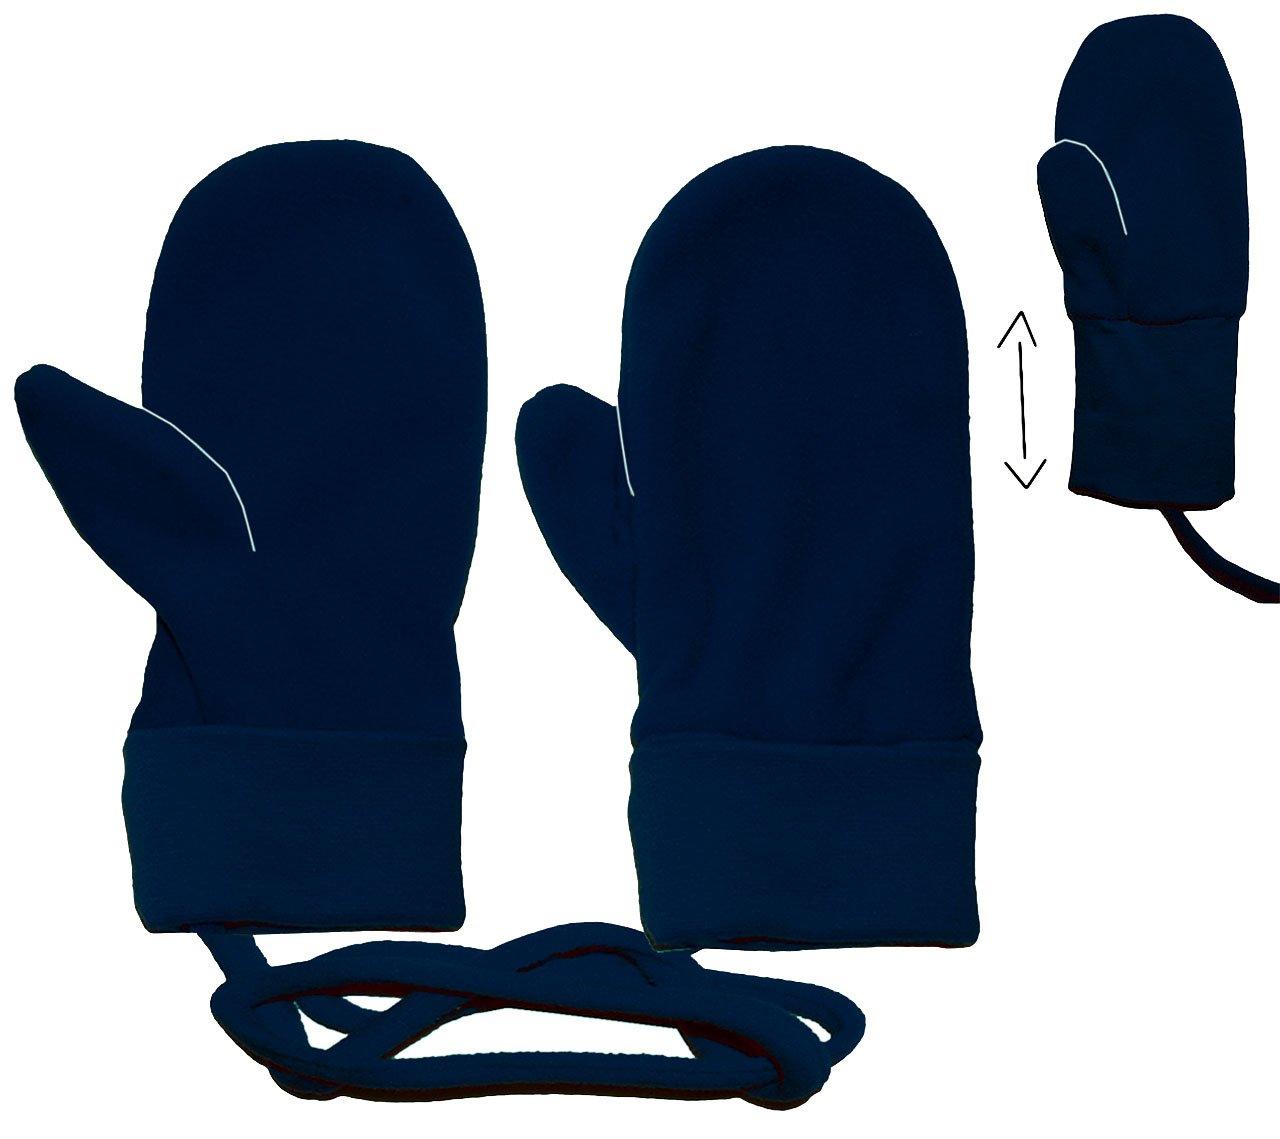 dunkelblau Unbekannt Handschuhe // Fleecehandschuhe Fleece F/äustlinge // D/äumlinge mit Daumen Babyhandschuhe 2 Jahre bis 4 Jahre Baby Erstlingshandschuhe .. Gr